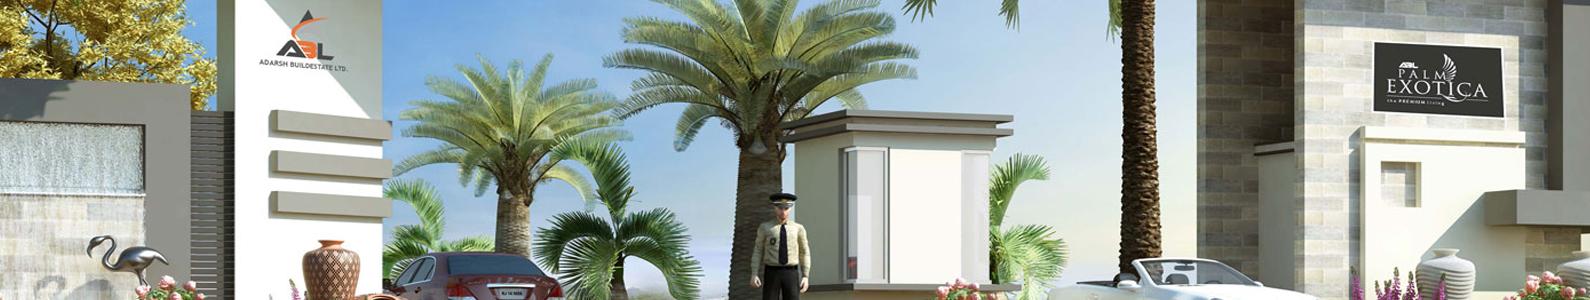 http://www.getsellproperty.com/builder/adarsh/palmexotica/header.jpg